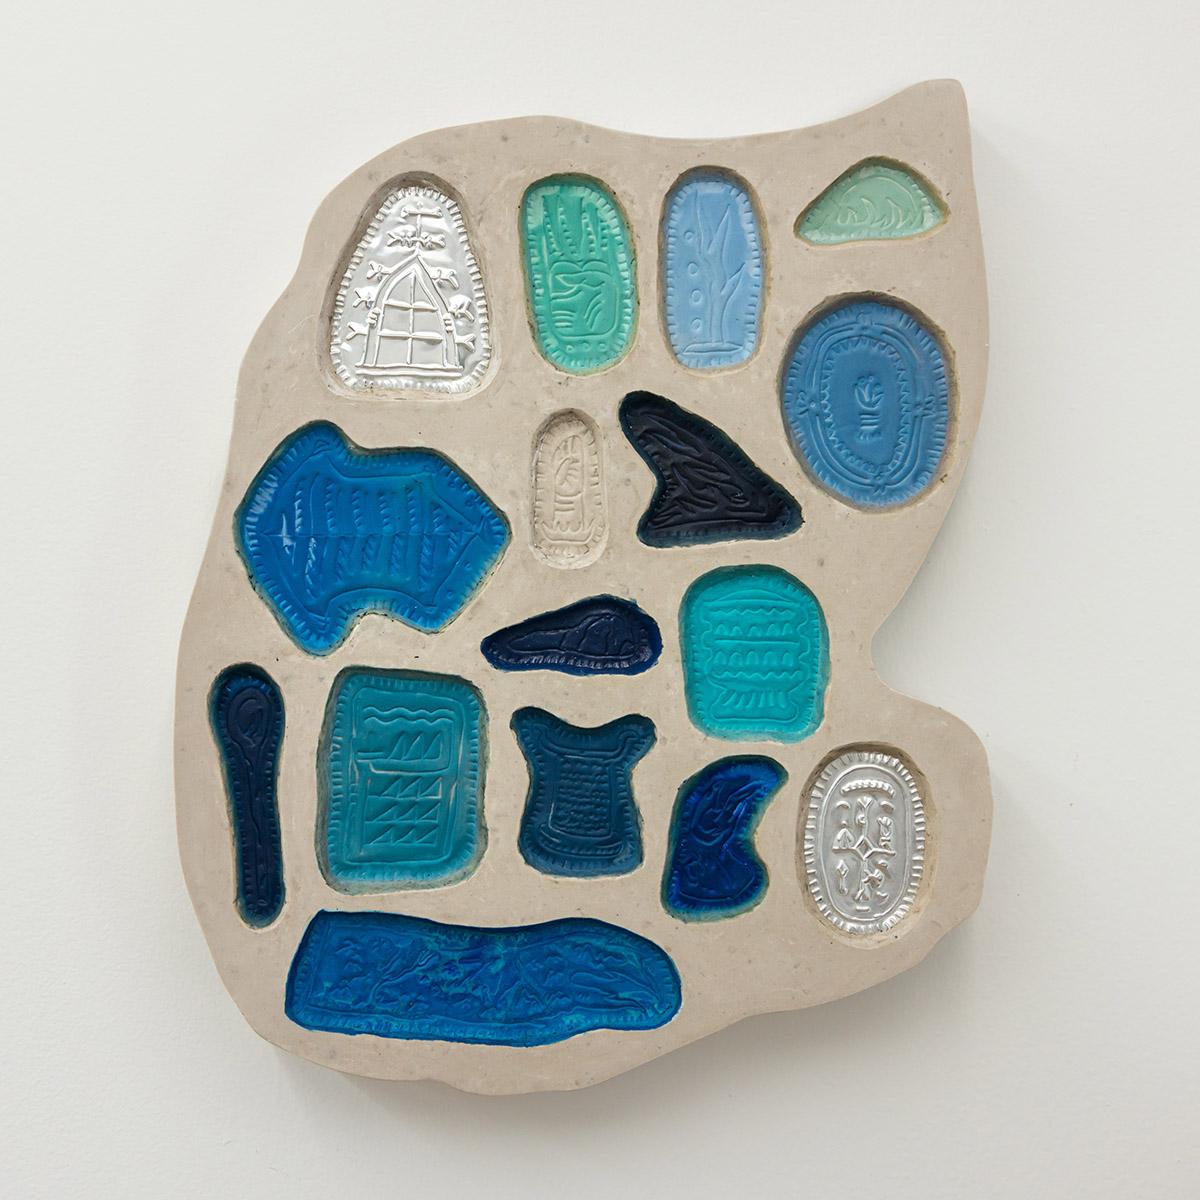 Matias Armendaris, 'Mixing Tablet II', Sculpture, concrete, Aqua-Resin, embossed brass, pigment, 18 x 22 x 2,5 in, 2017